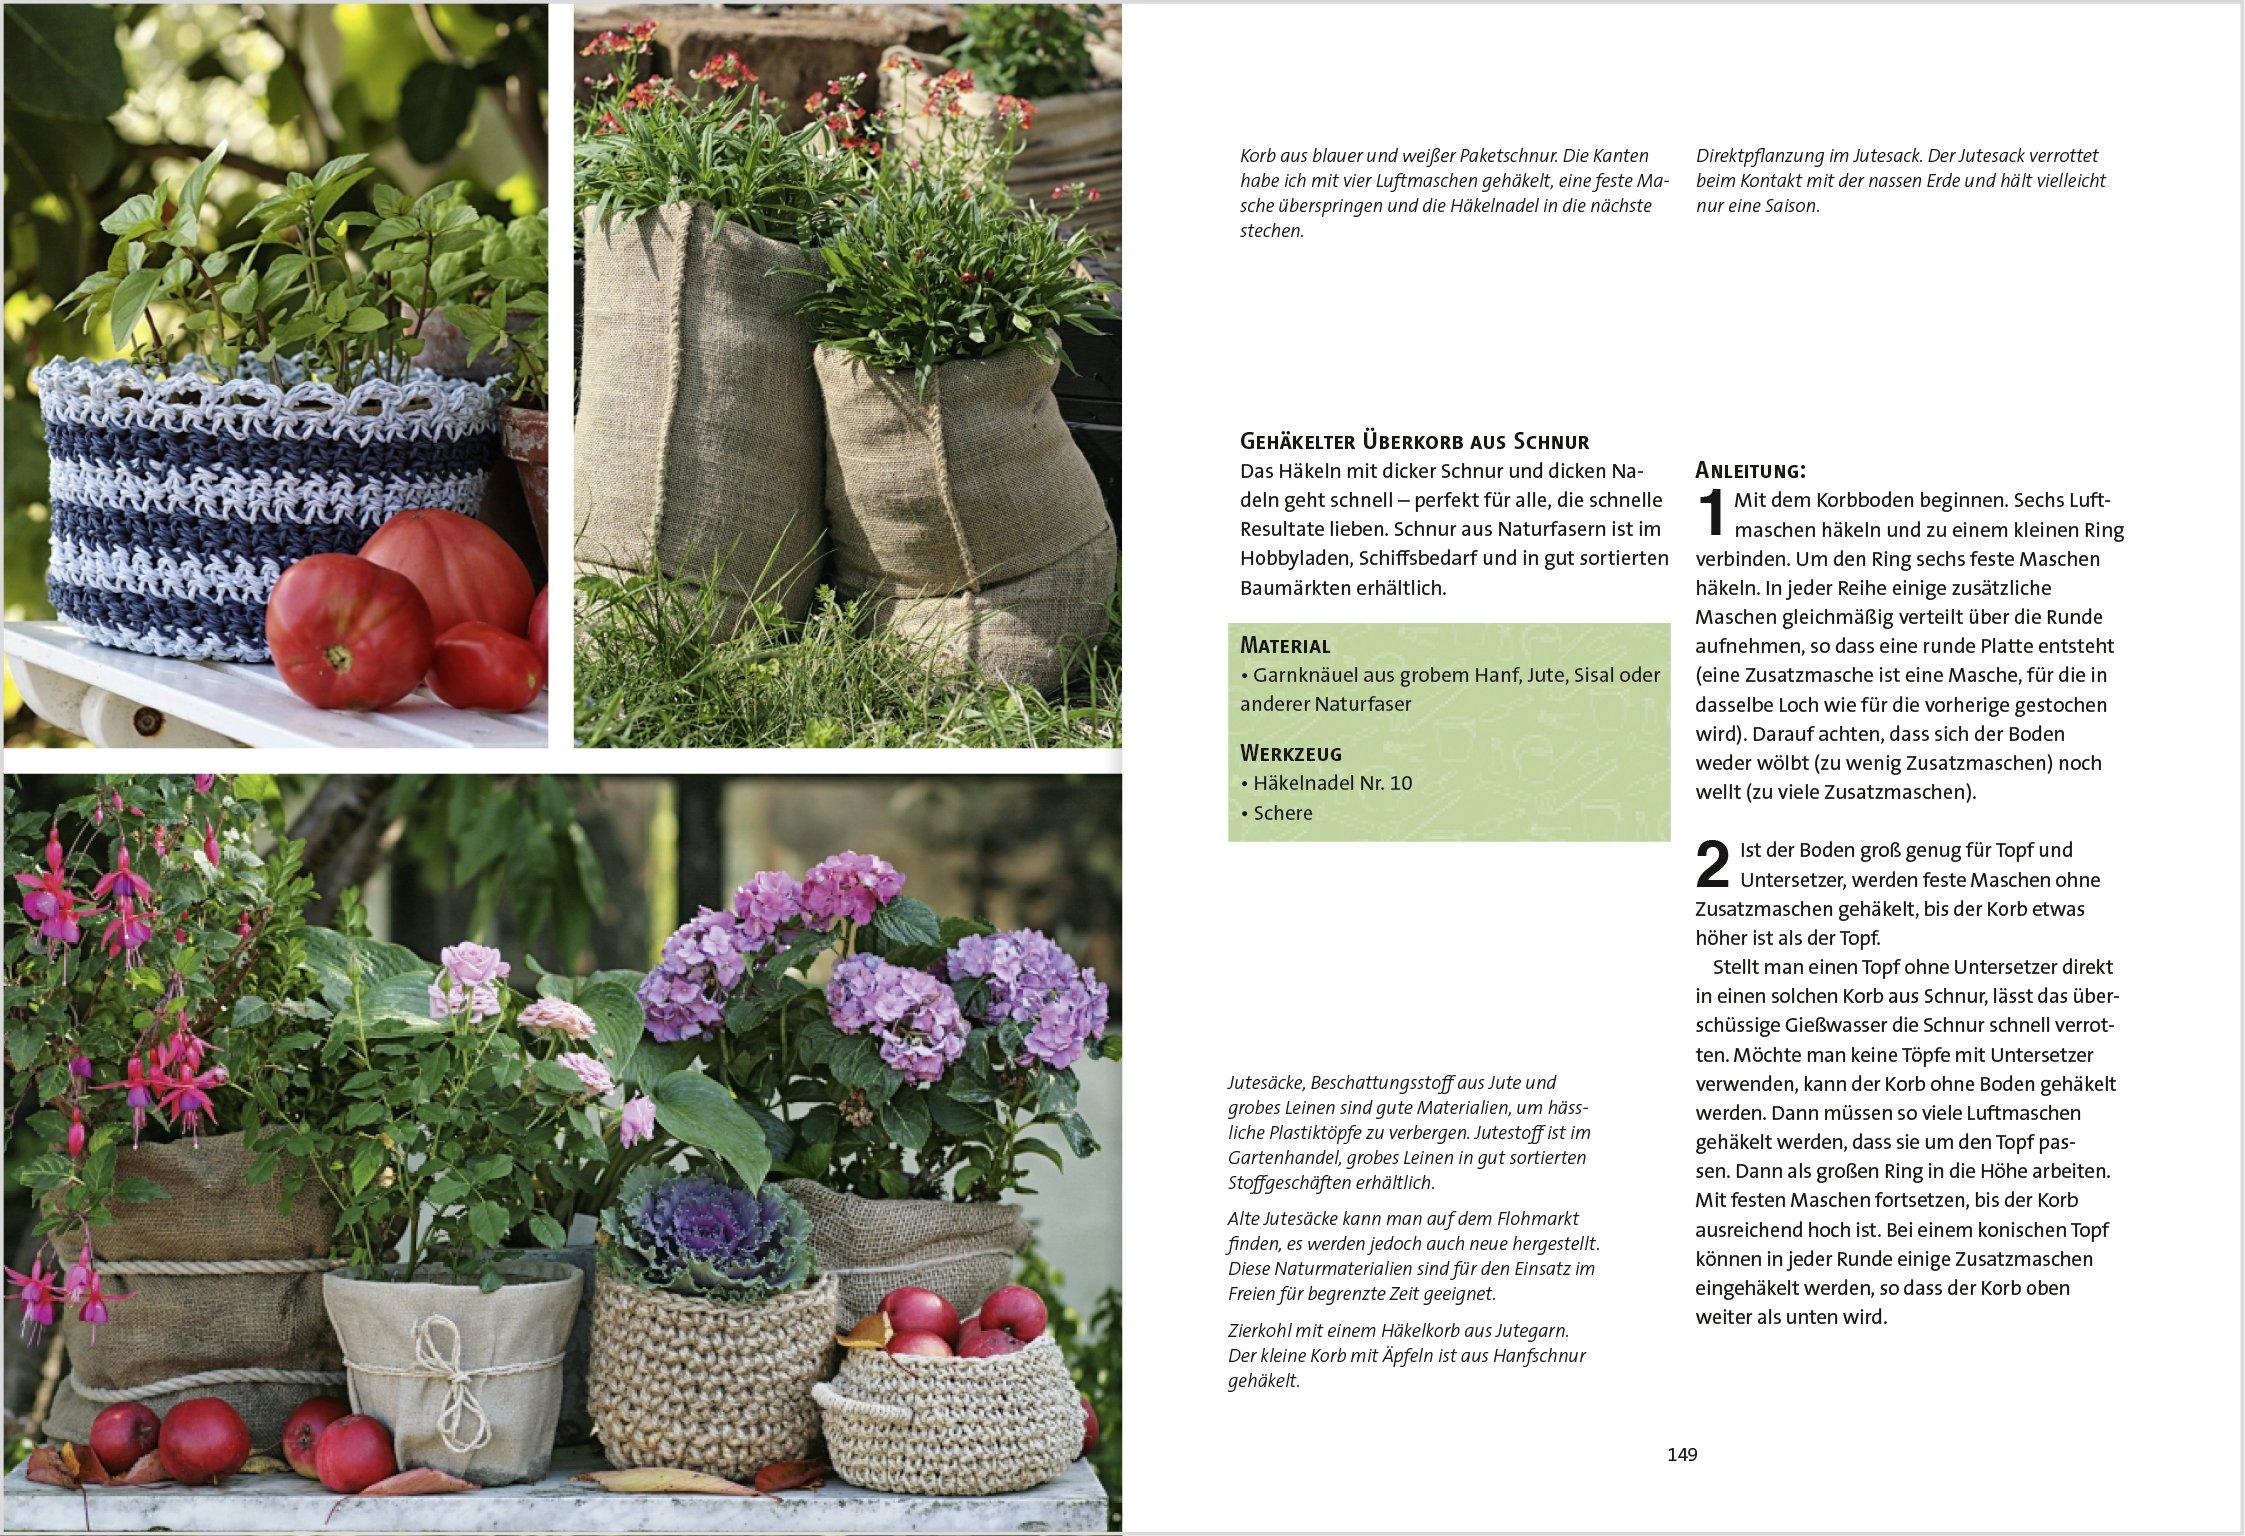 100 Kreative Garten Projekte 9783784353517 Amazoncom Books